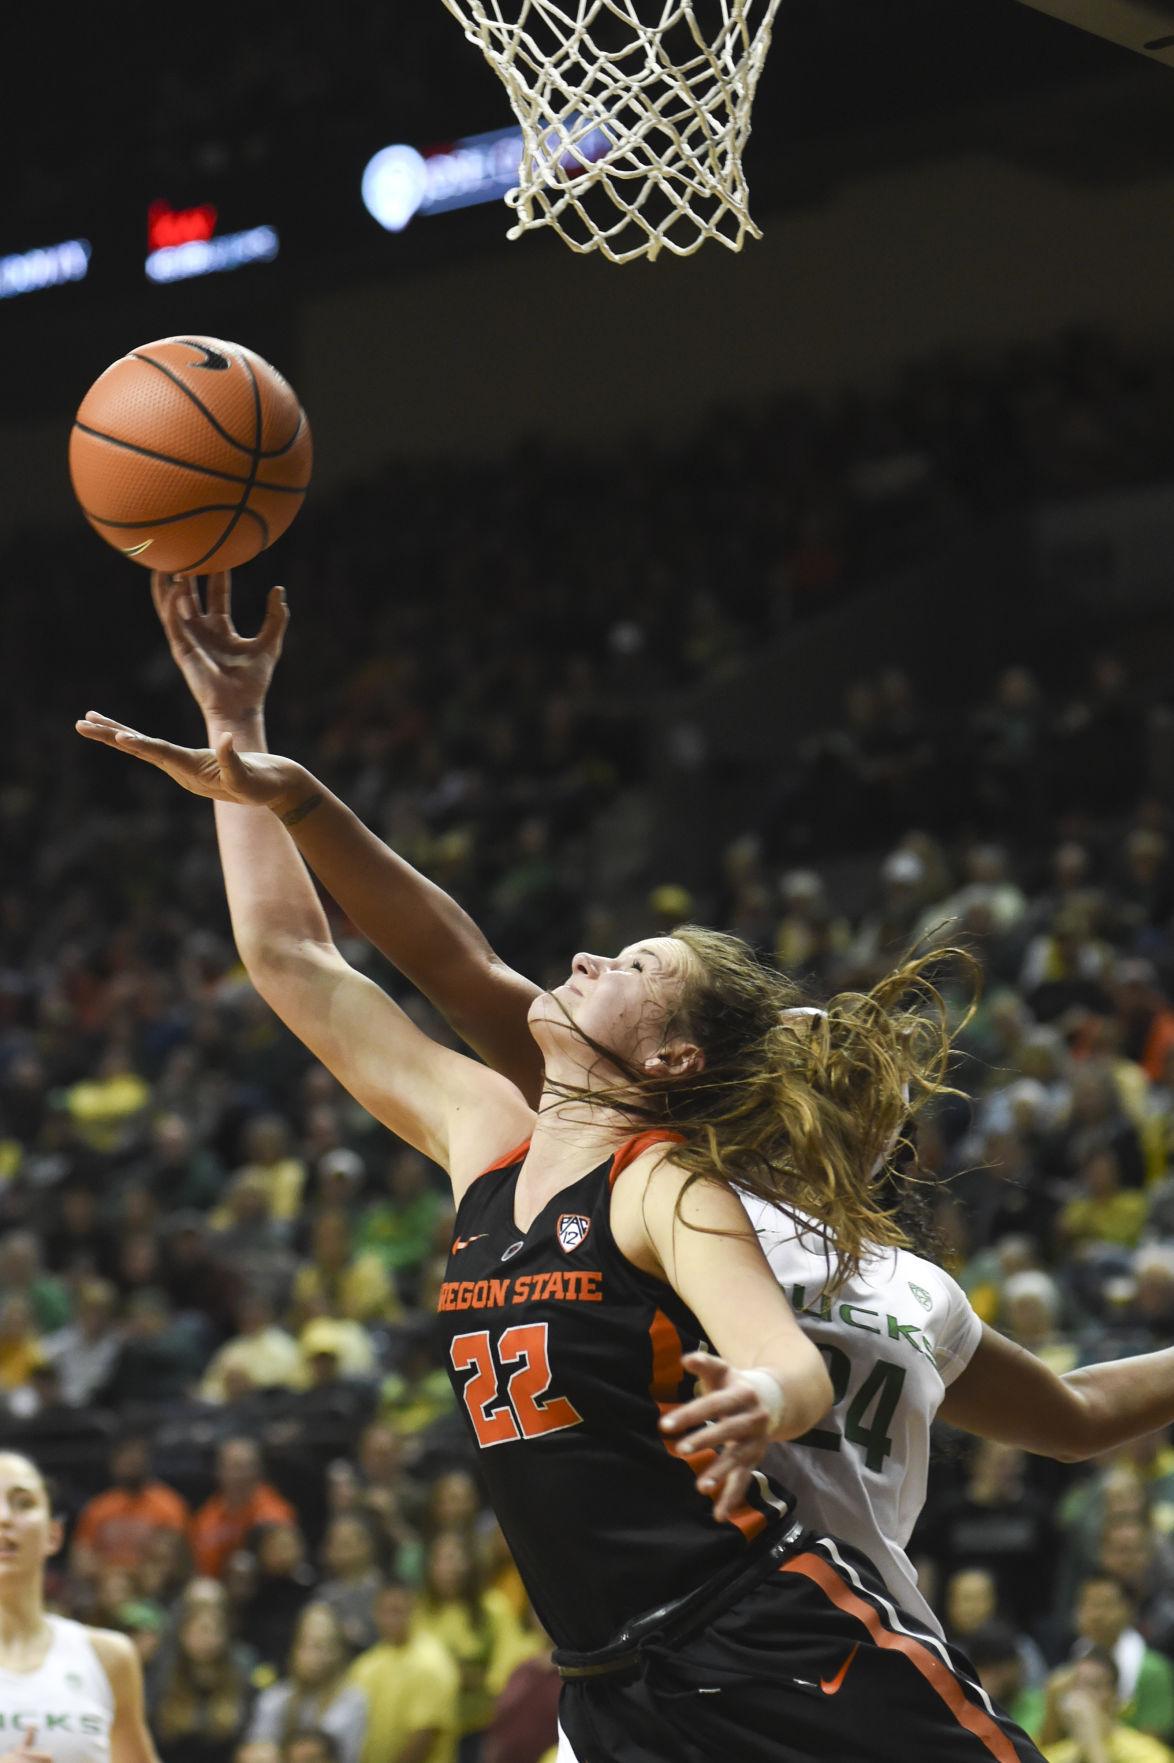 Oregon State vs. University of Oregon Women's Basketball